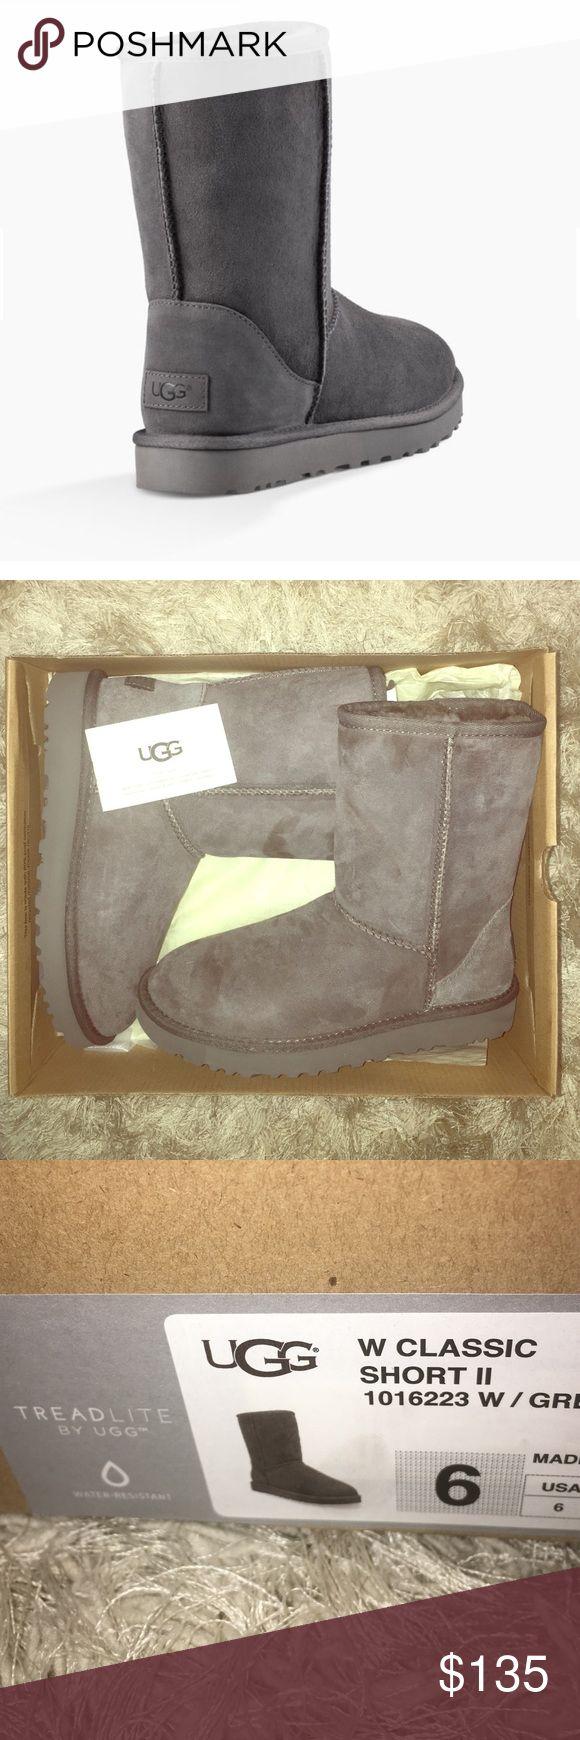 best 25 ugg website ideas on sparkly uggs ugg boots